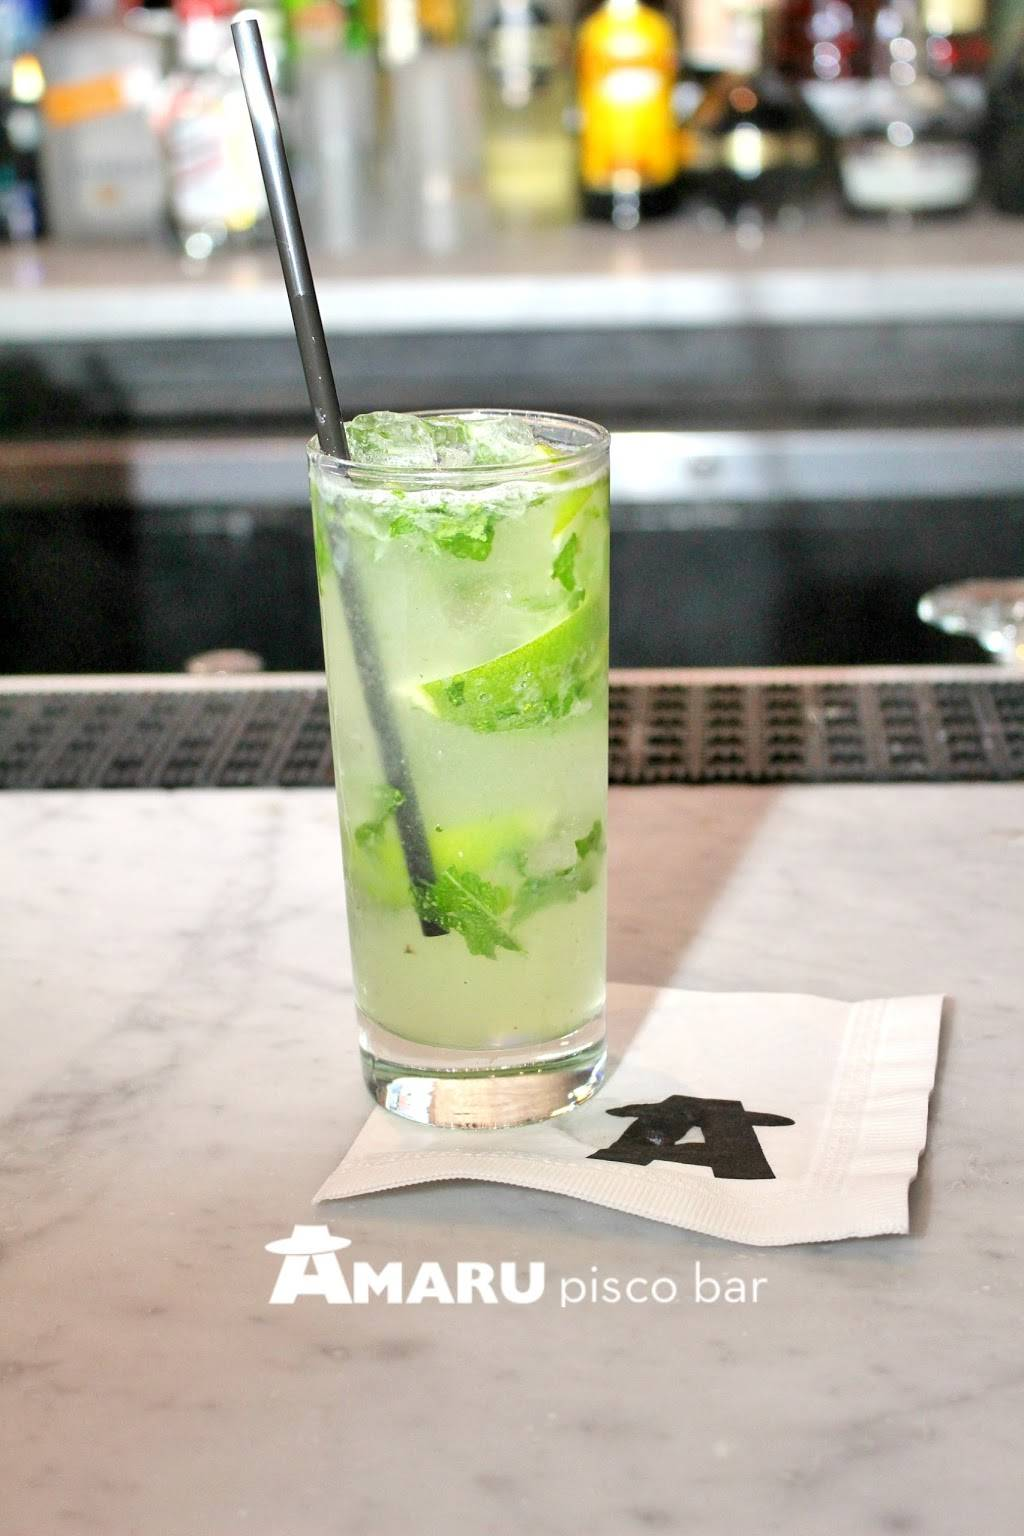 Amaru Bar | restaurant | 84-13 Northern Blvd, Jackson Heights, NY 11372, USA | 7182055577 OR +1 718-205-5577